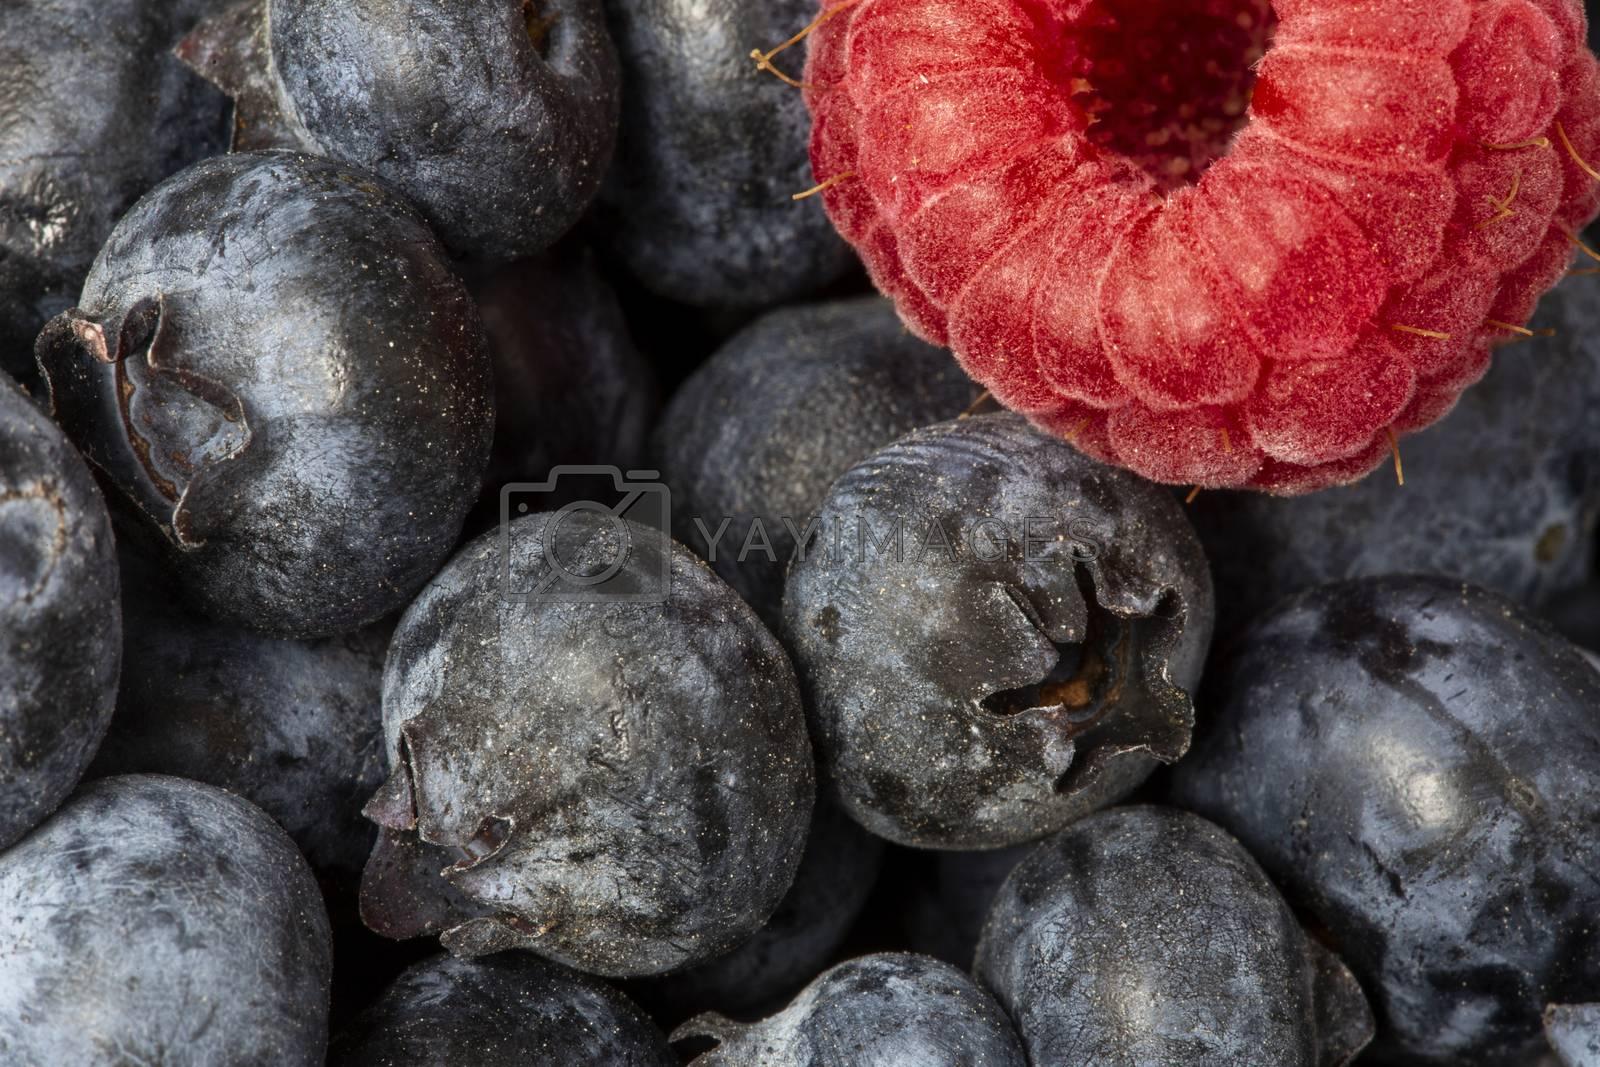 Macro Close Up Fruit Rasberry and blueberry